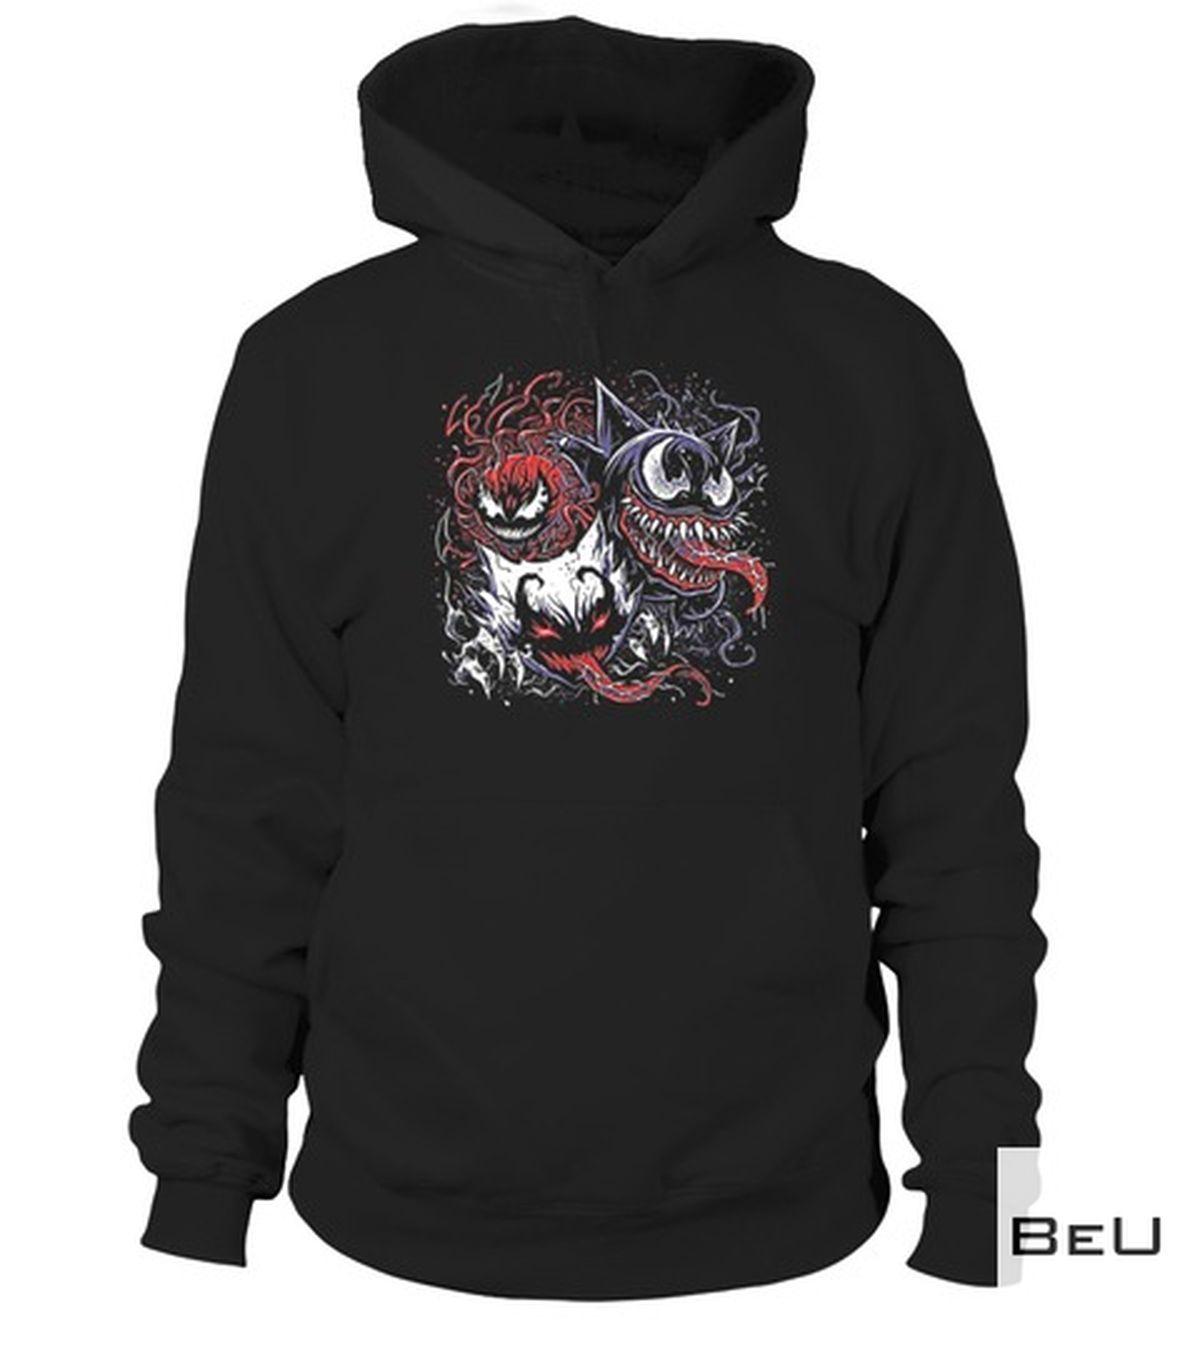 Vibrant Venom Gengar Pokemon Shirt, hoodie, tank top